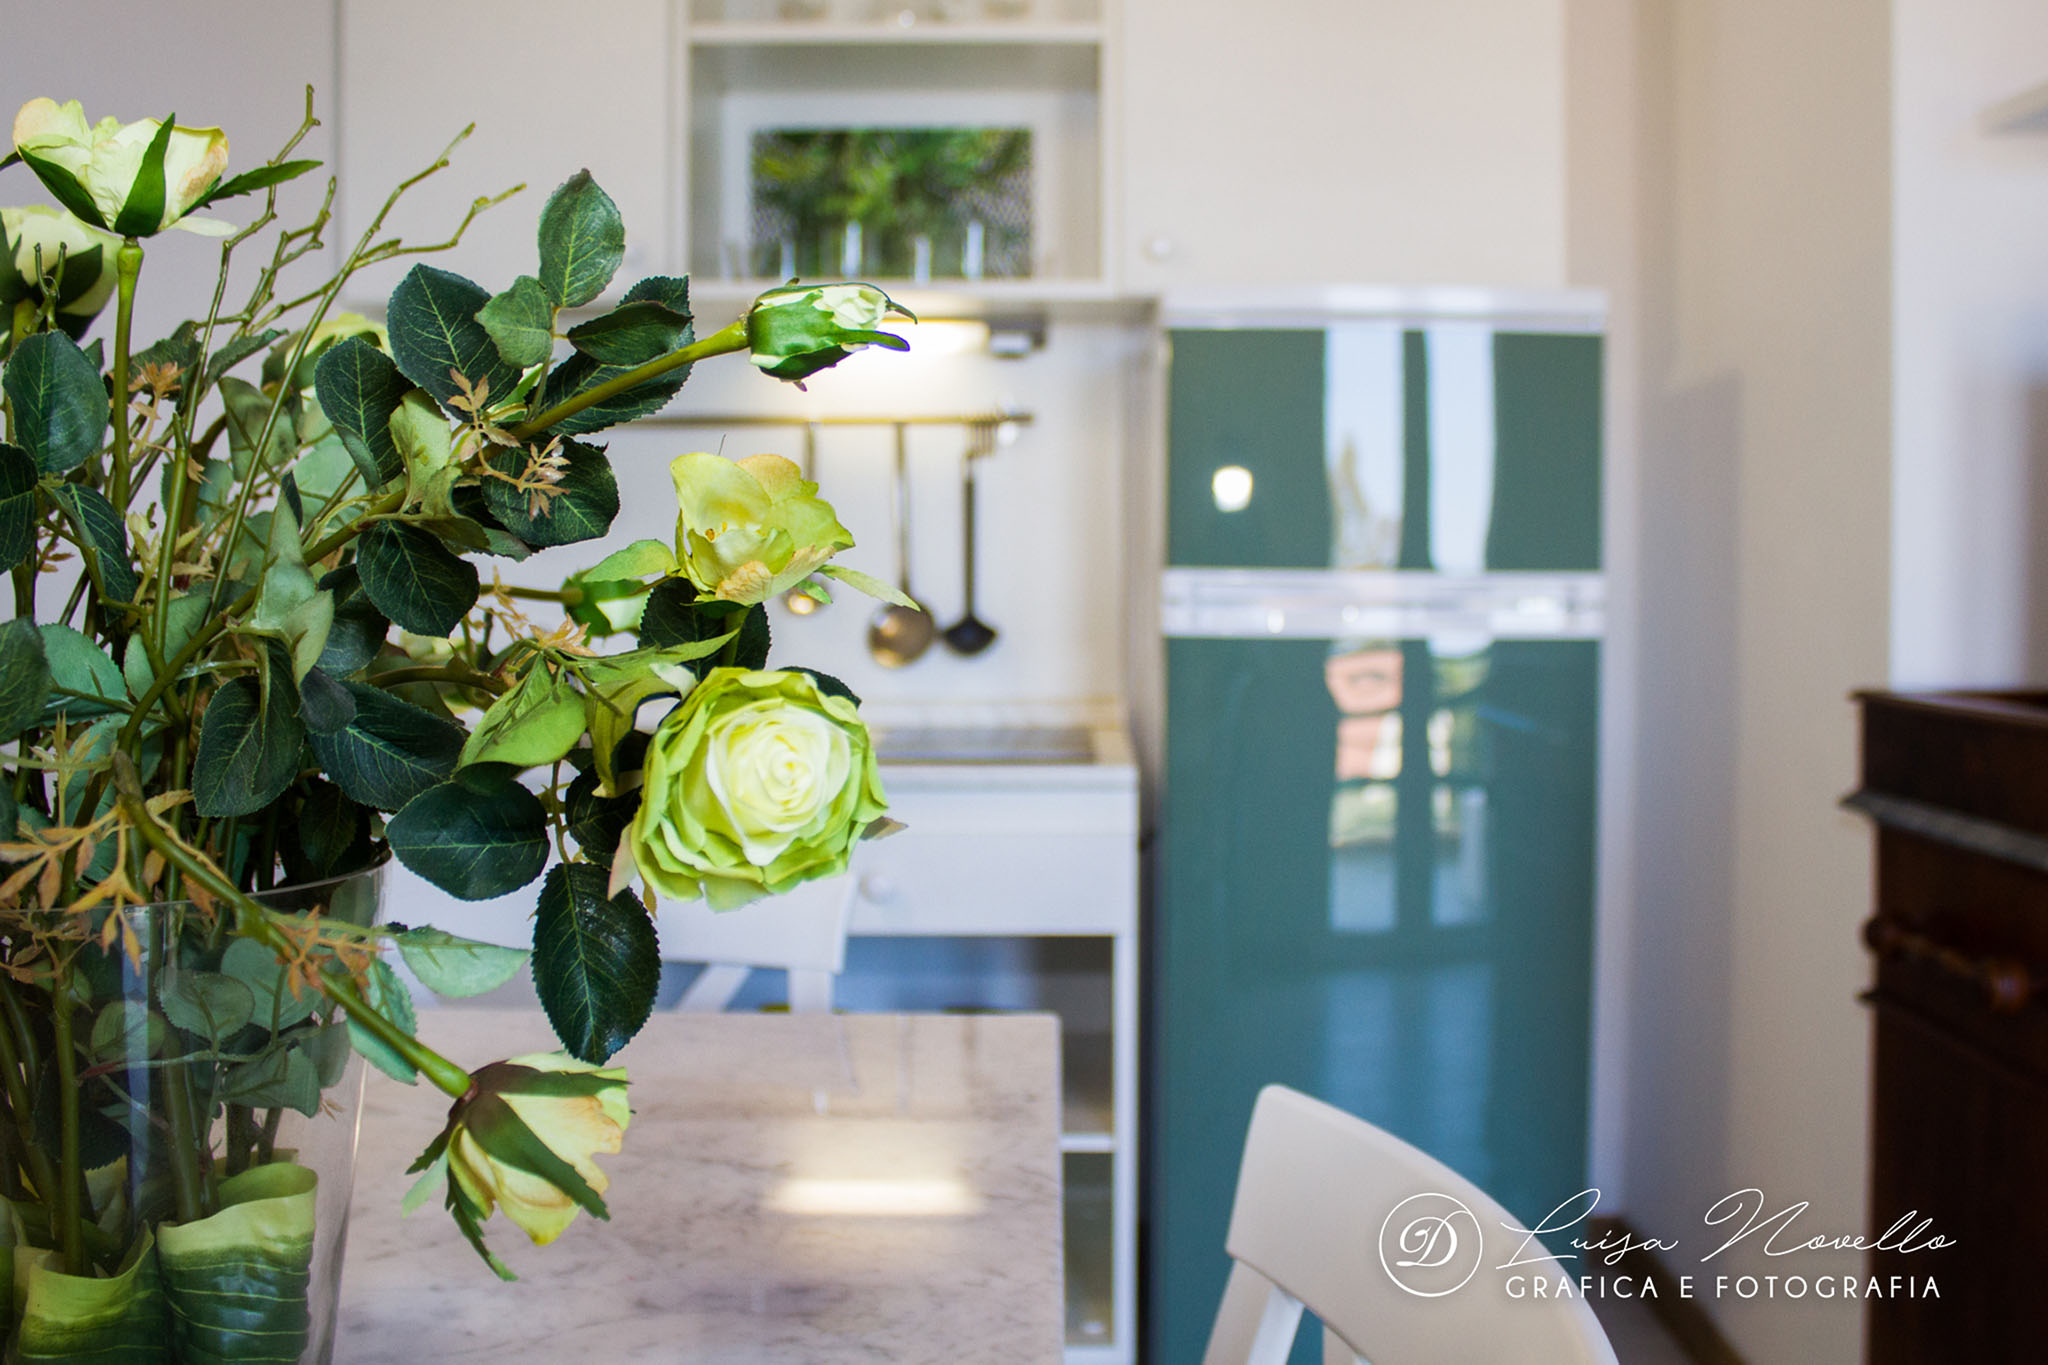 Fotografie di interni per agriturismi e residence